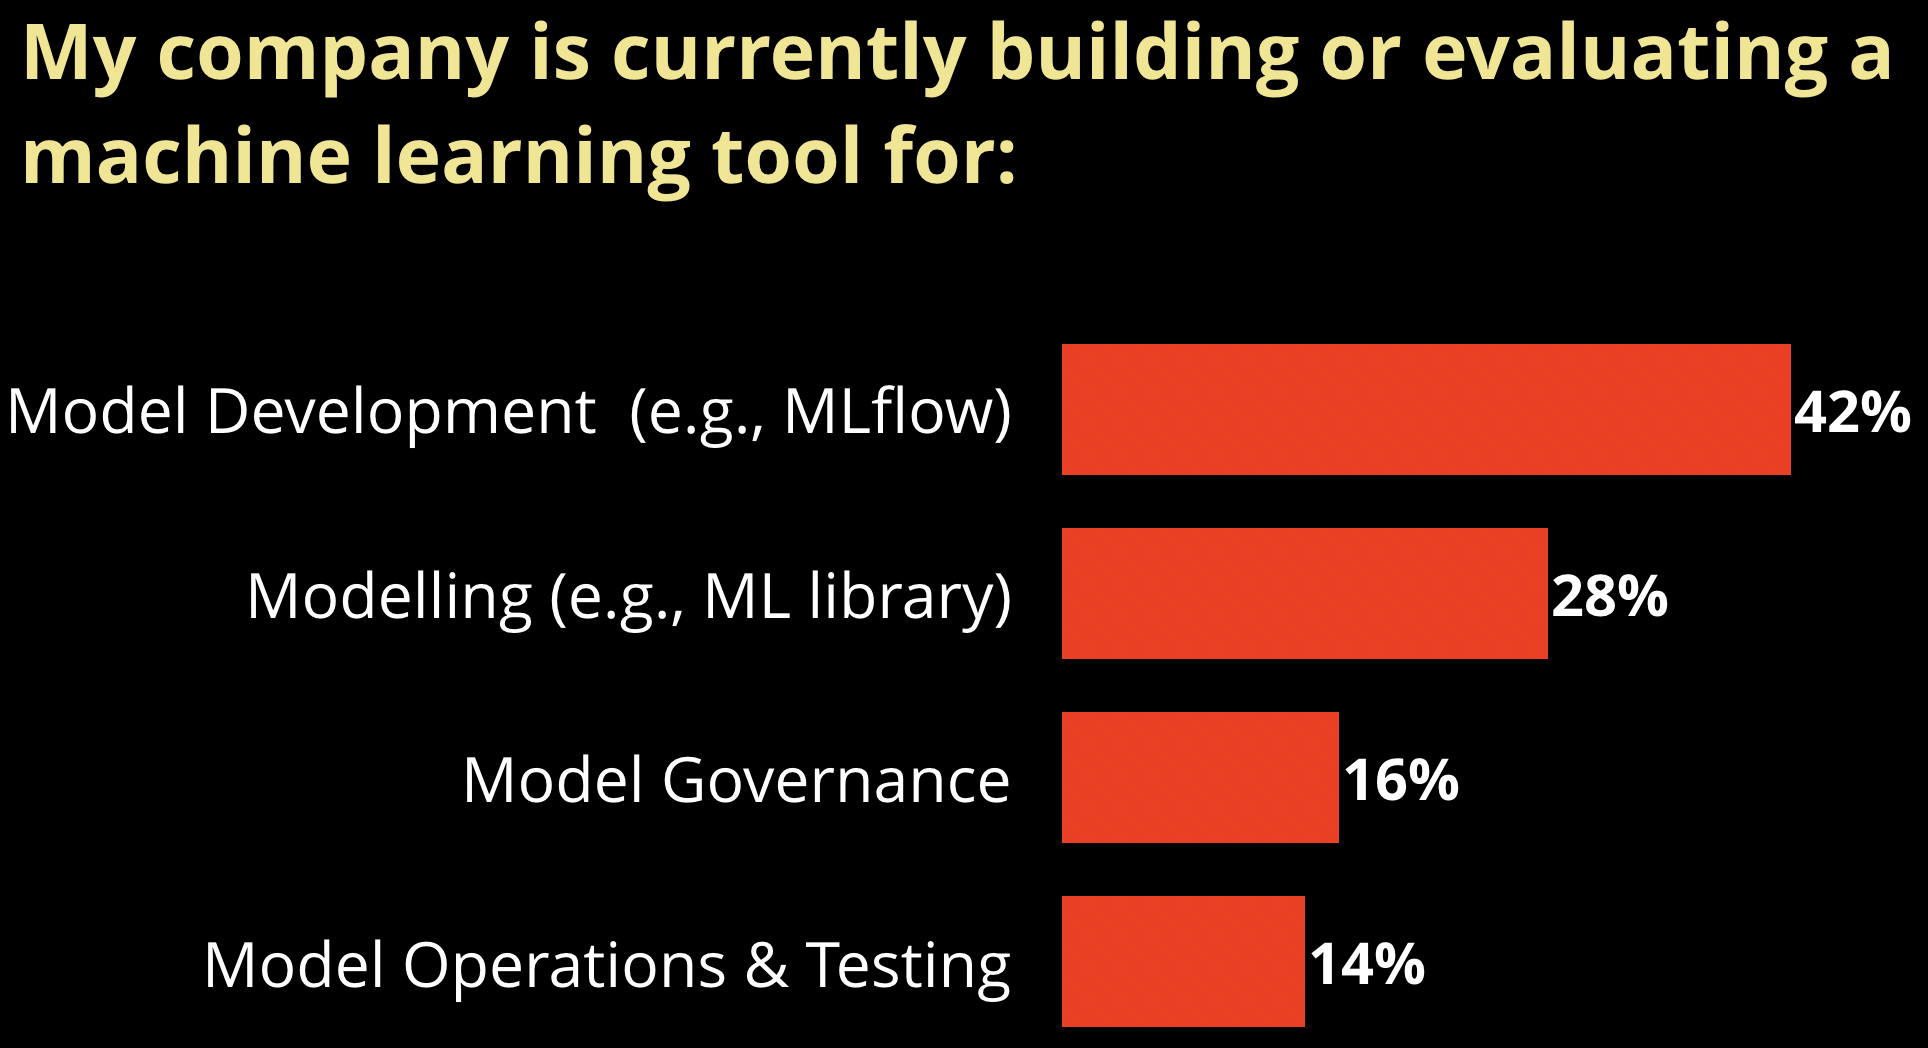 Company use of ML tools